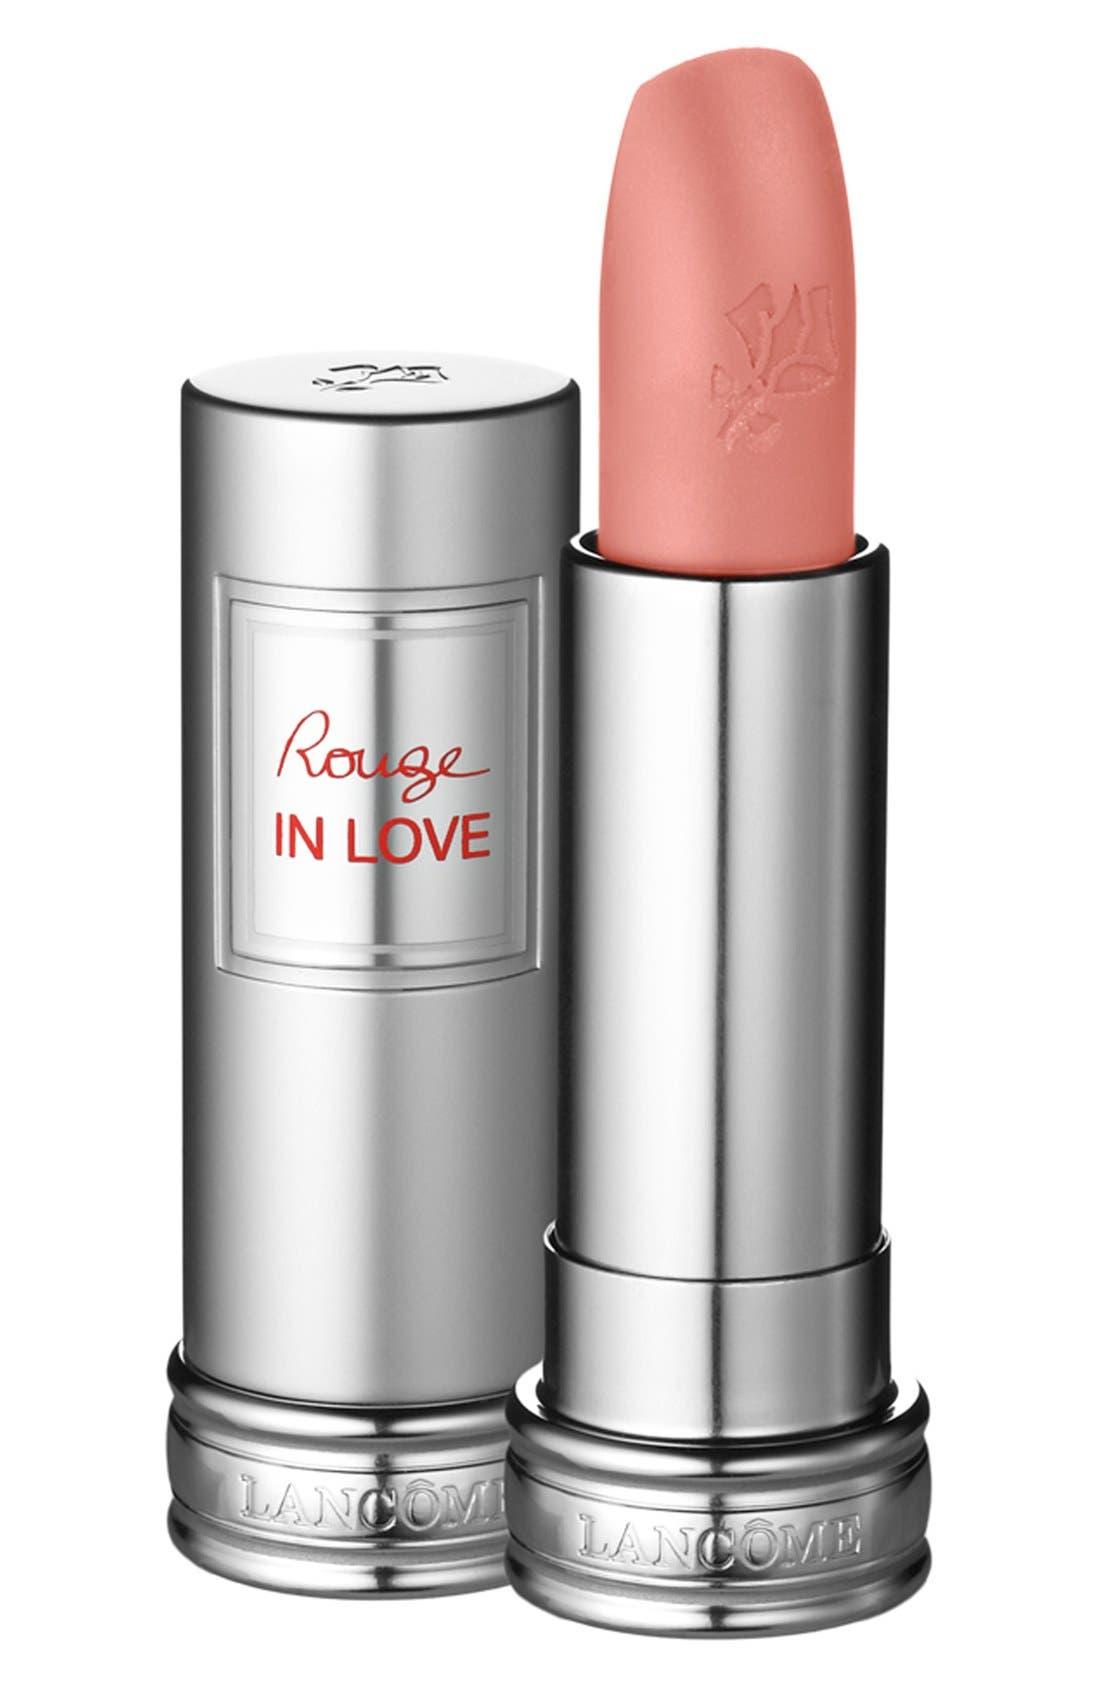 LANCÔME Rouge in Love Lipstick, Main, color, 620